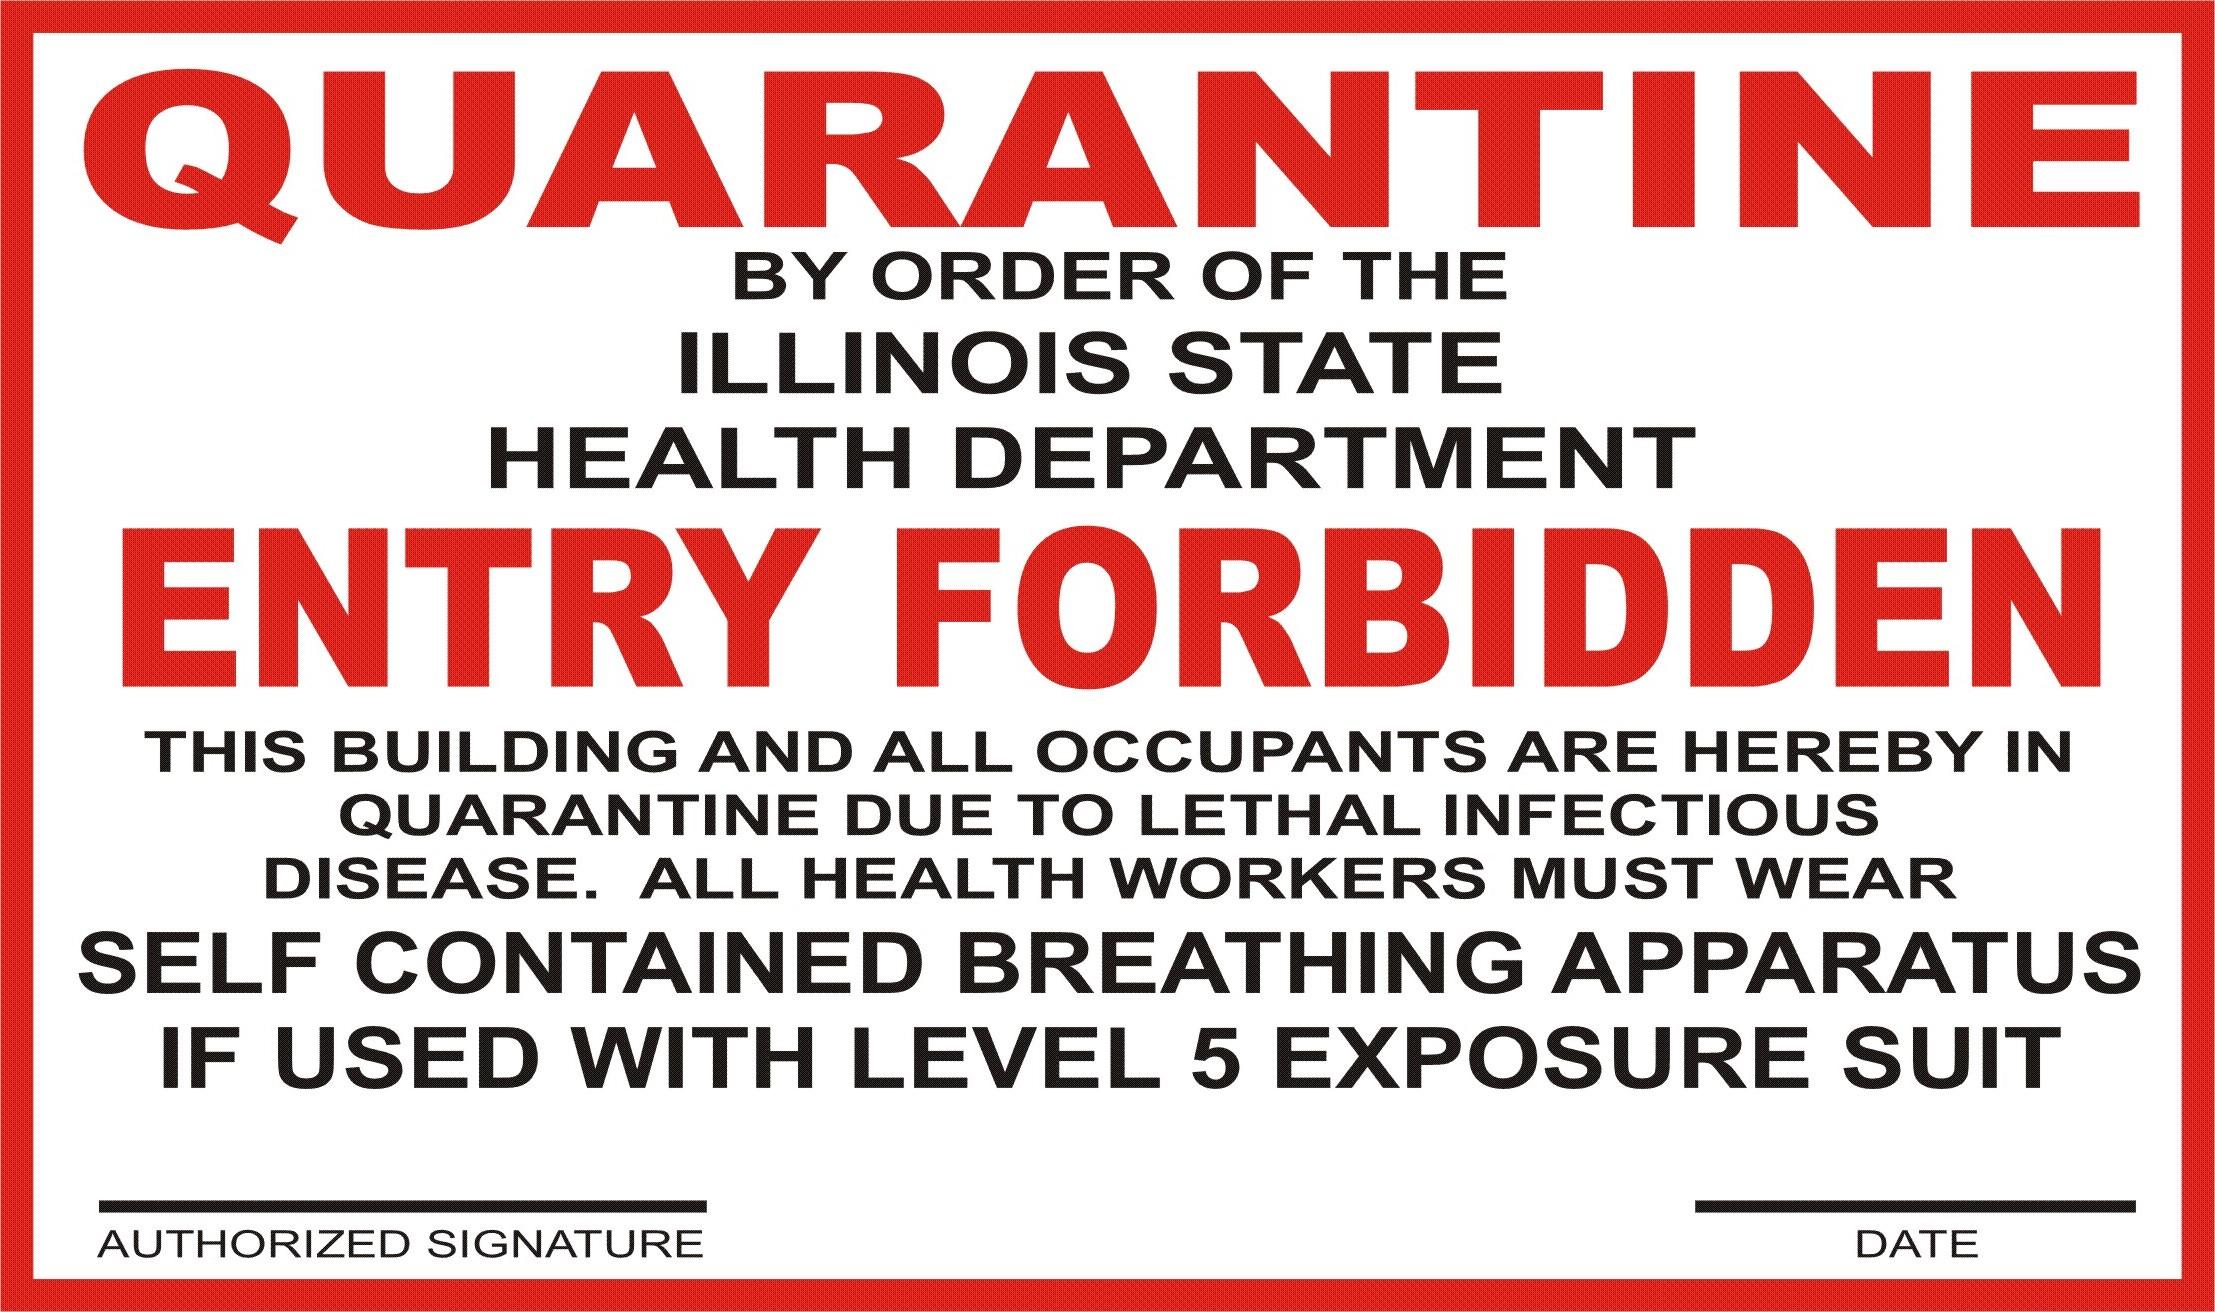 Trying to ward off thieves-quarantine-ill.jpg